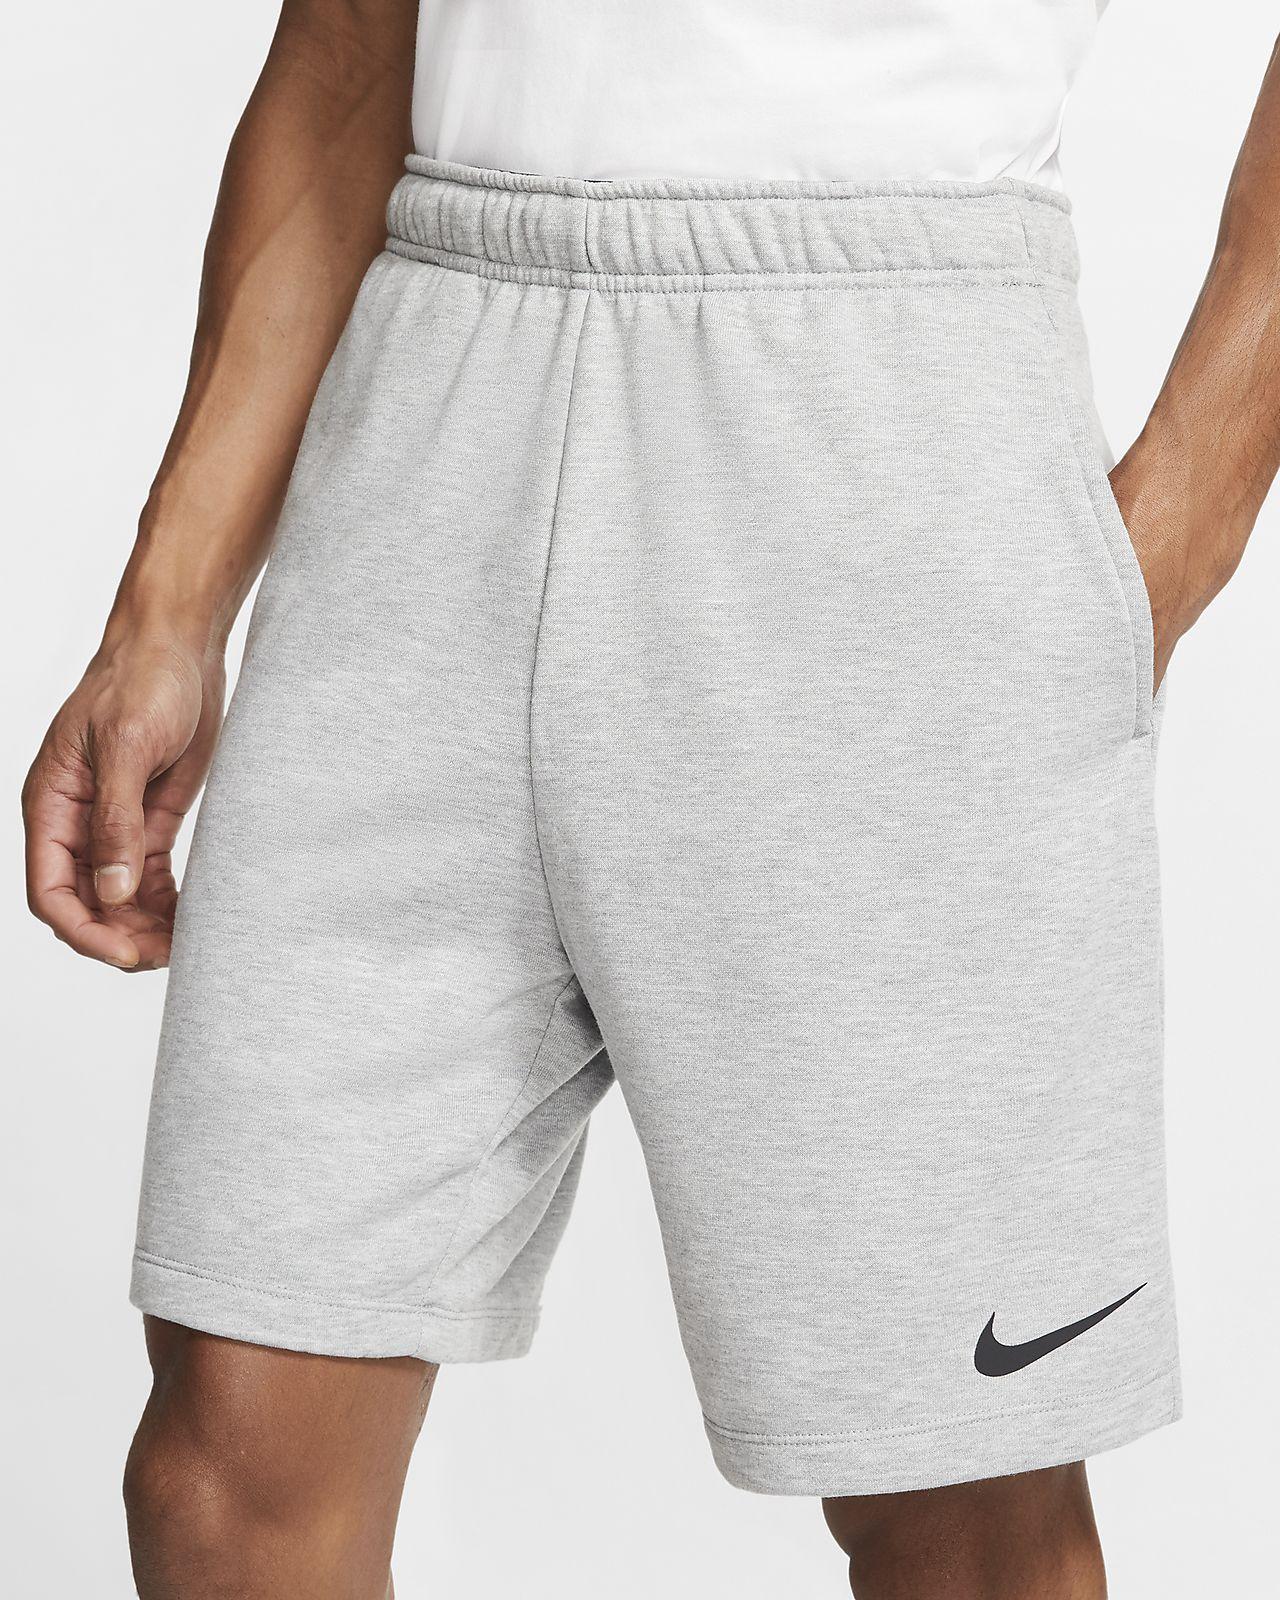 Nike Dri FIT Men's Fleece Training Shorts